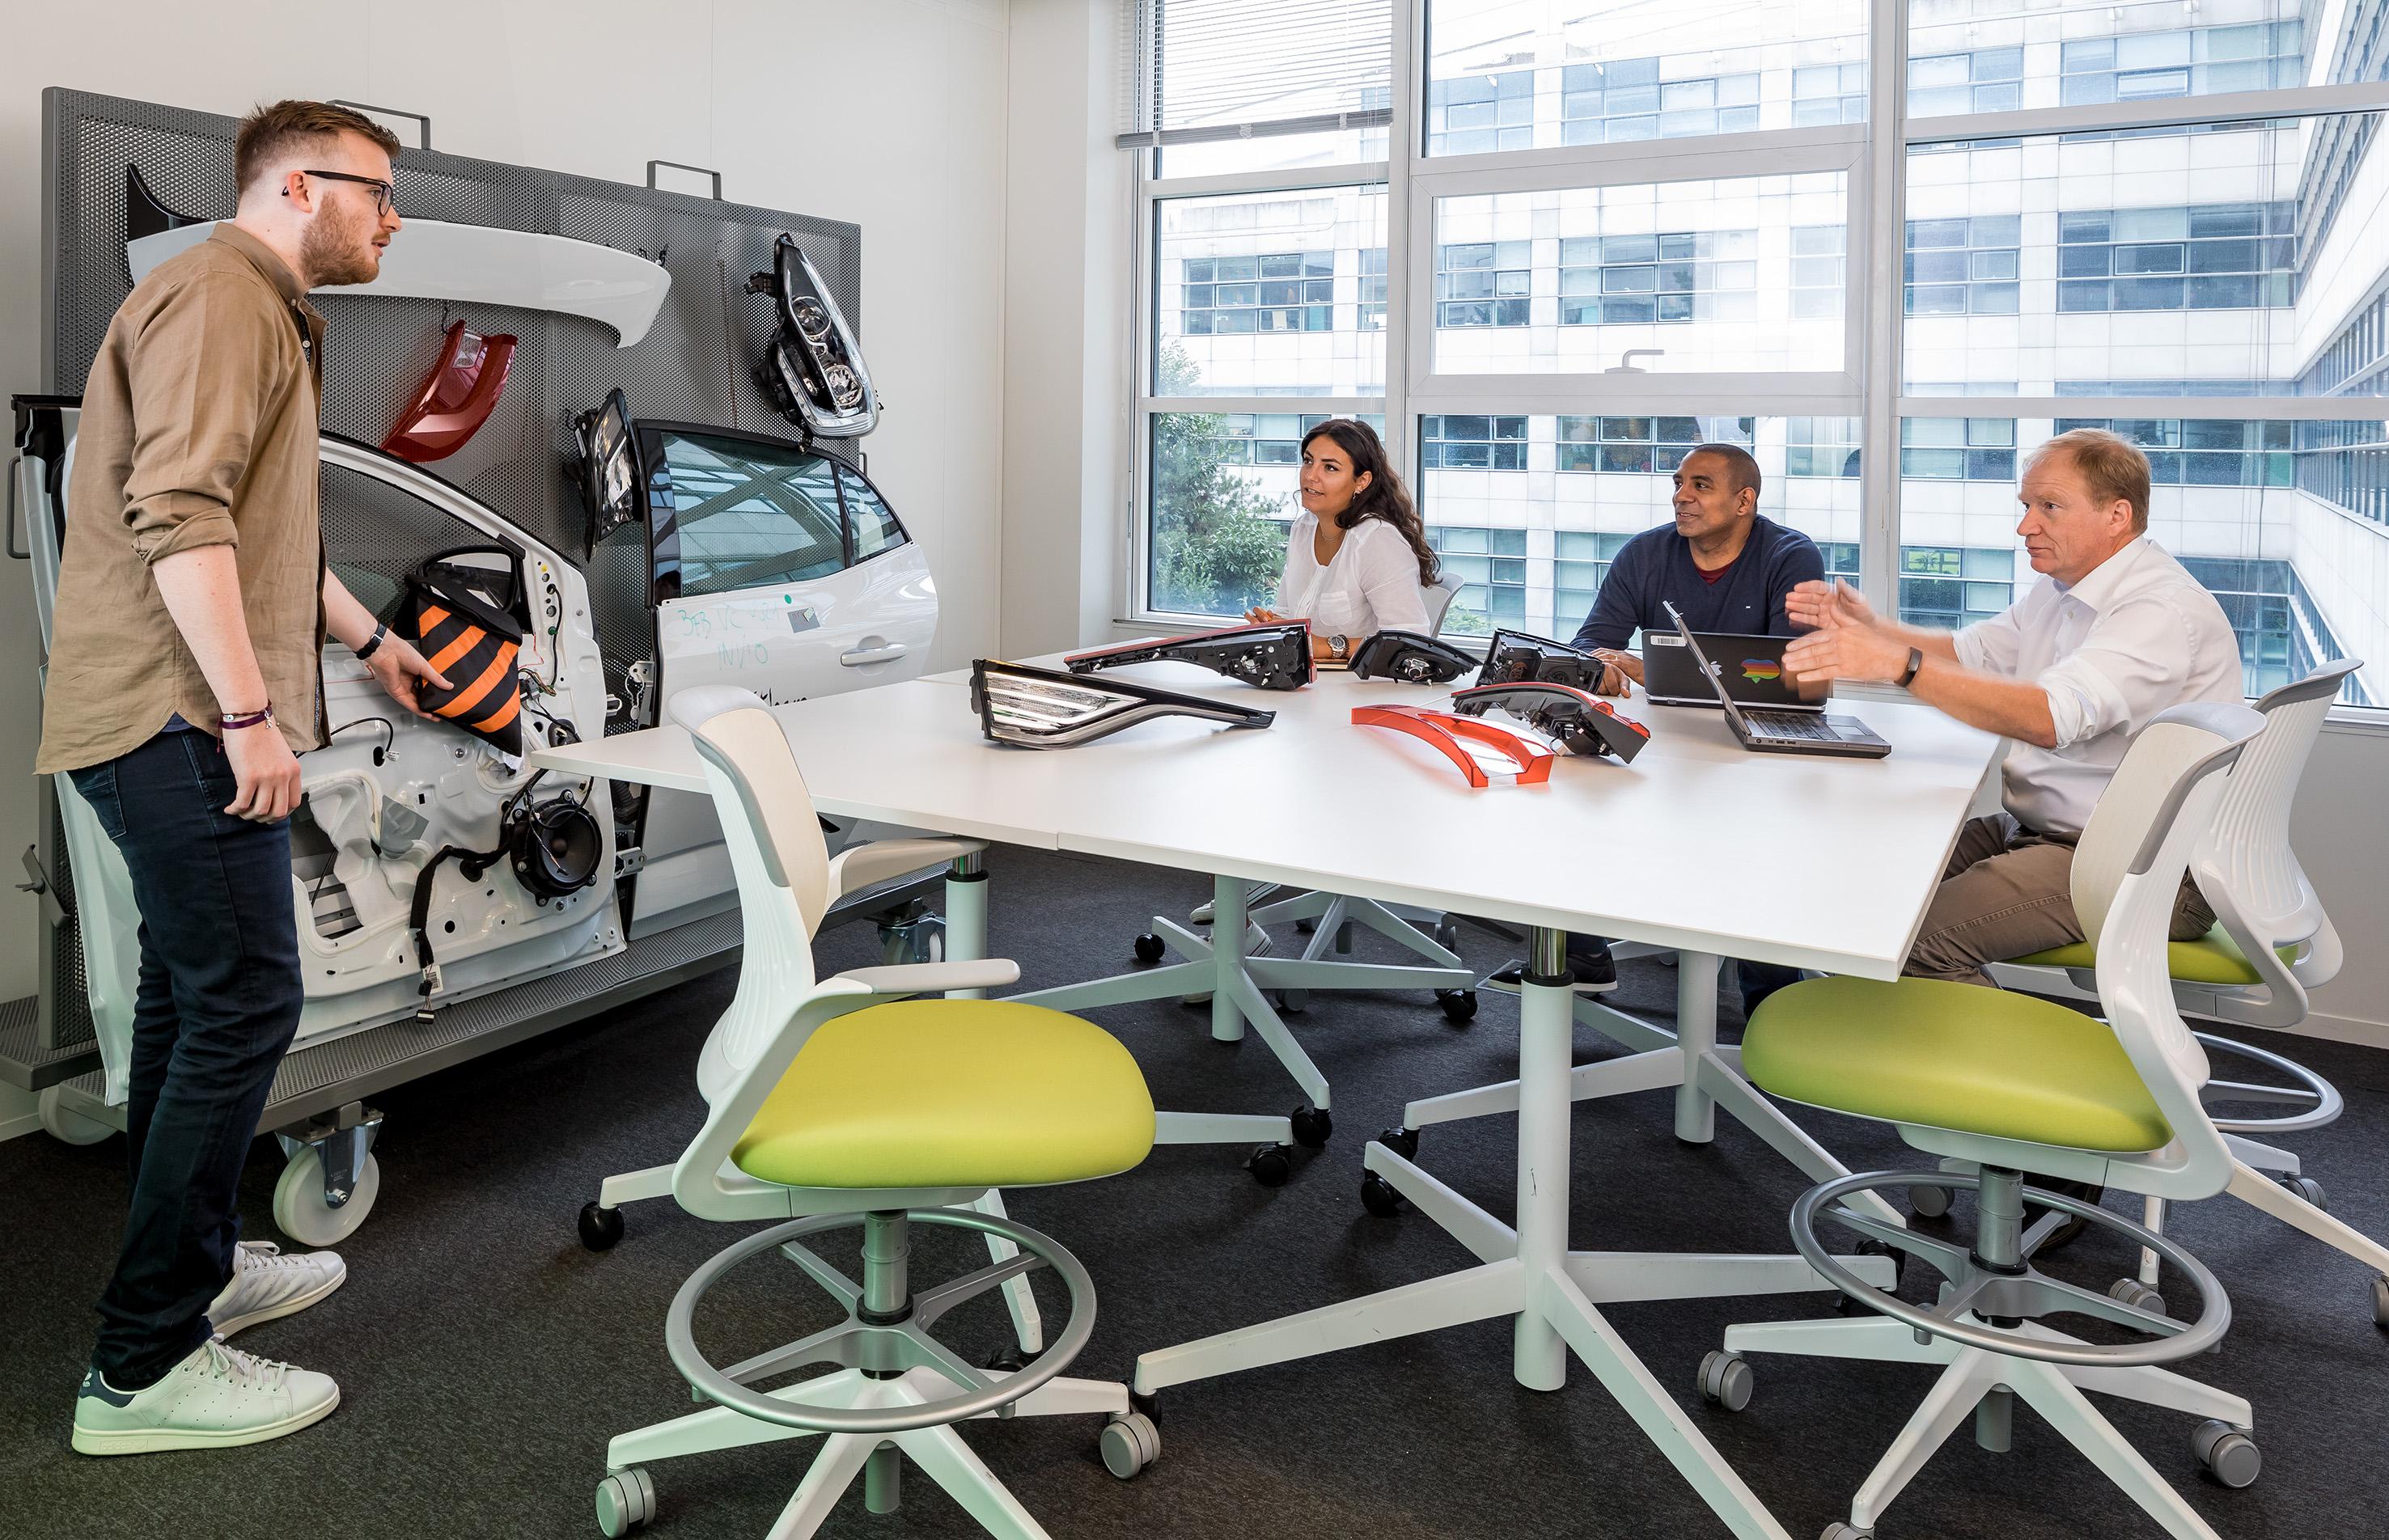 2018 - Groupe Renault - Fondation projet ETCR